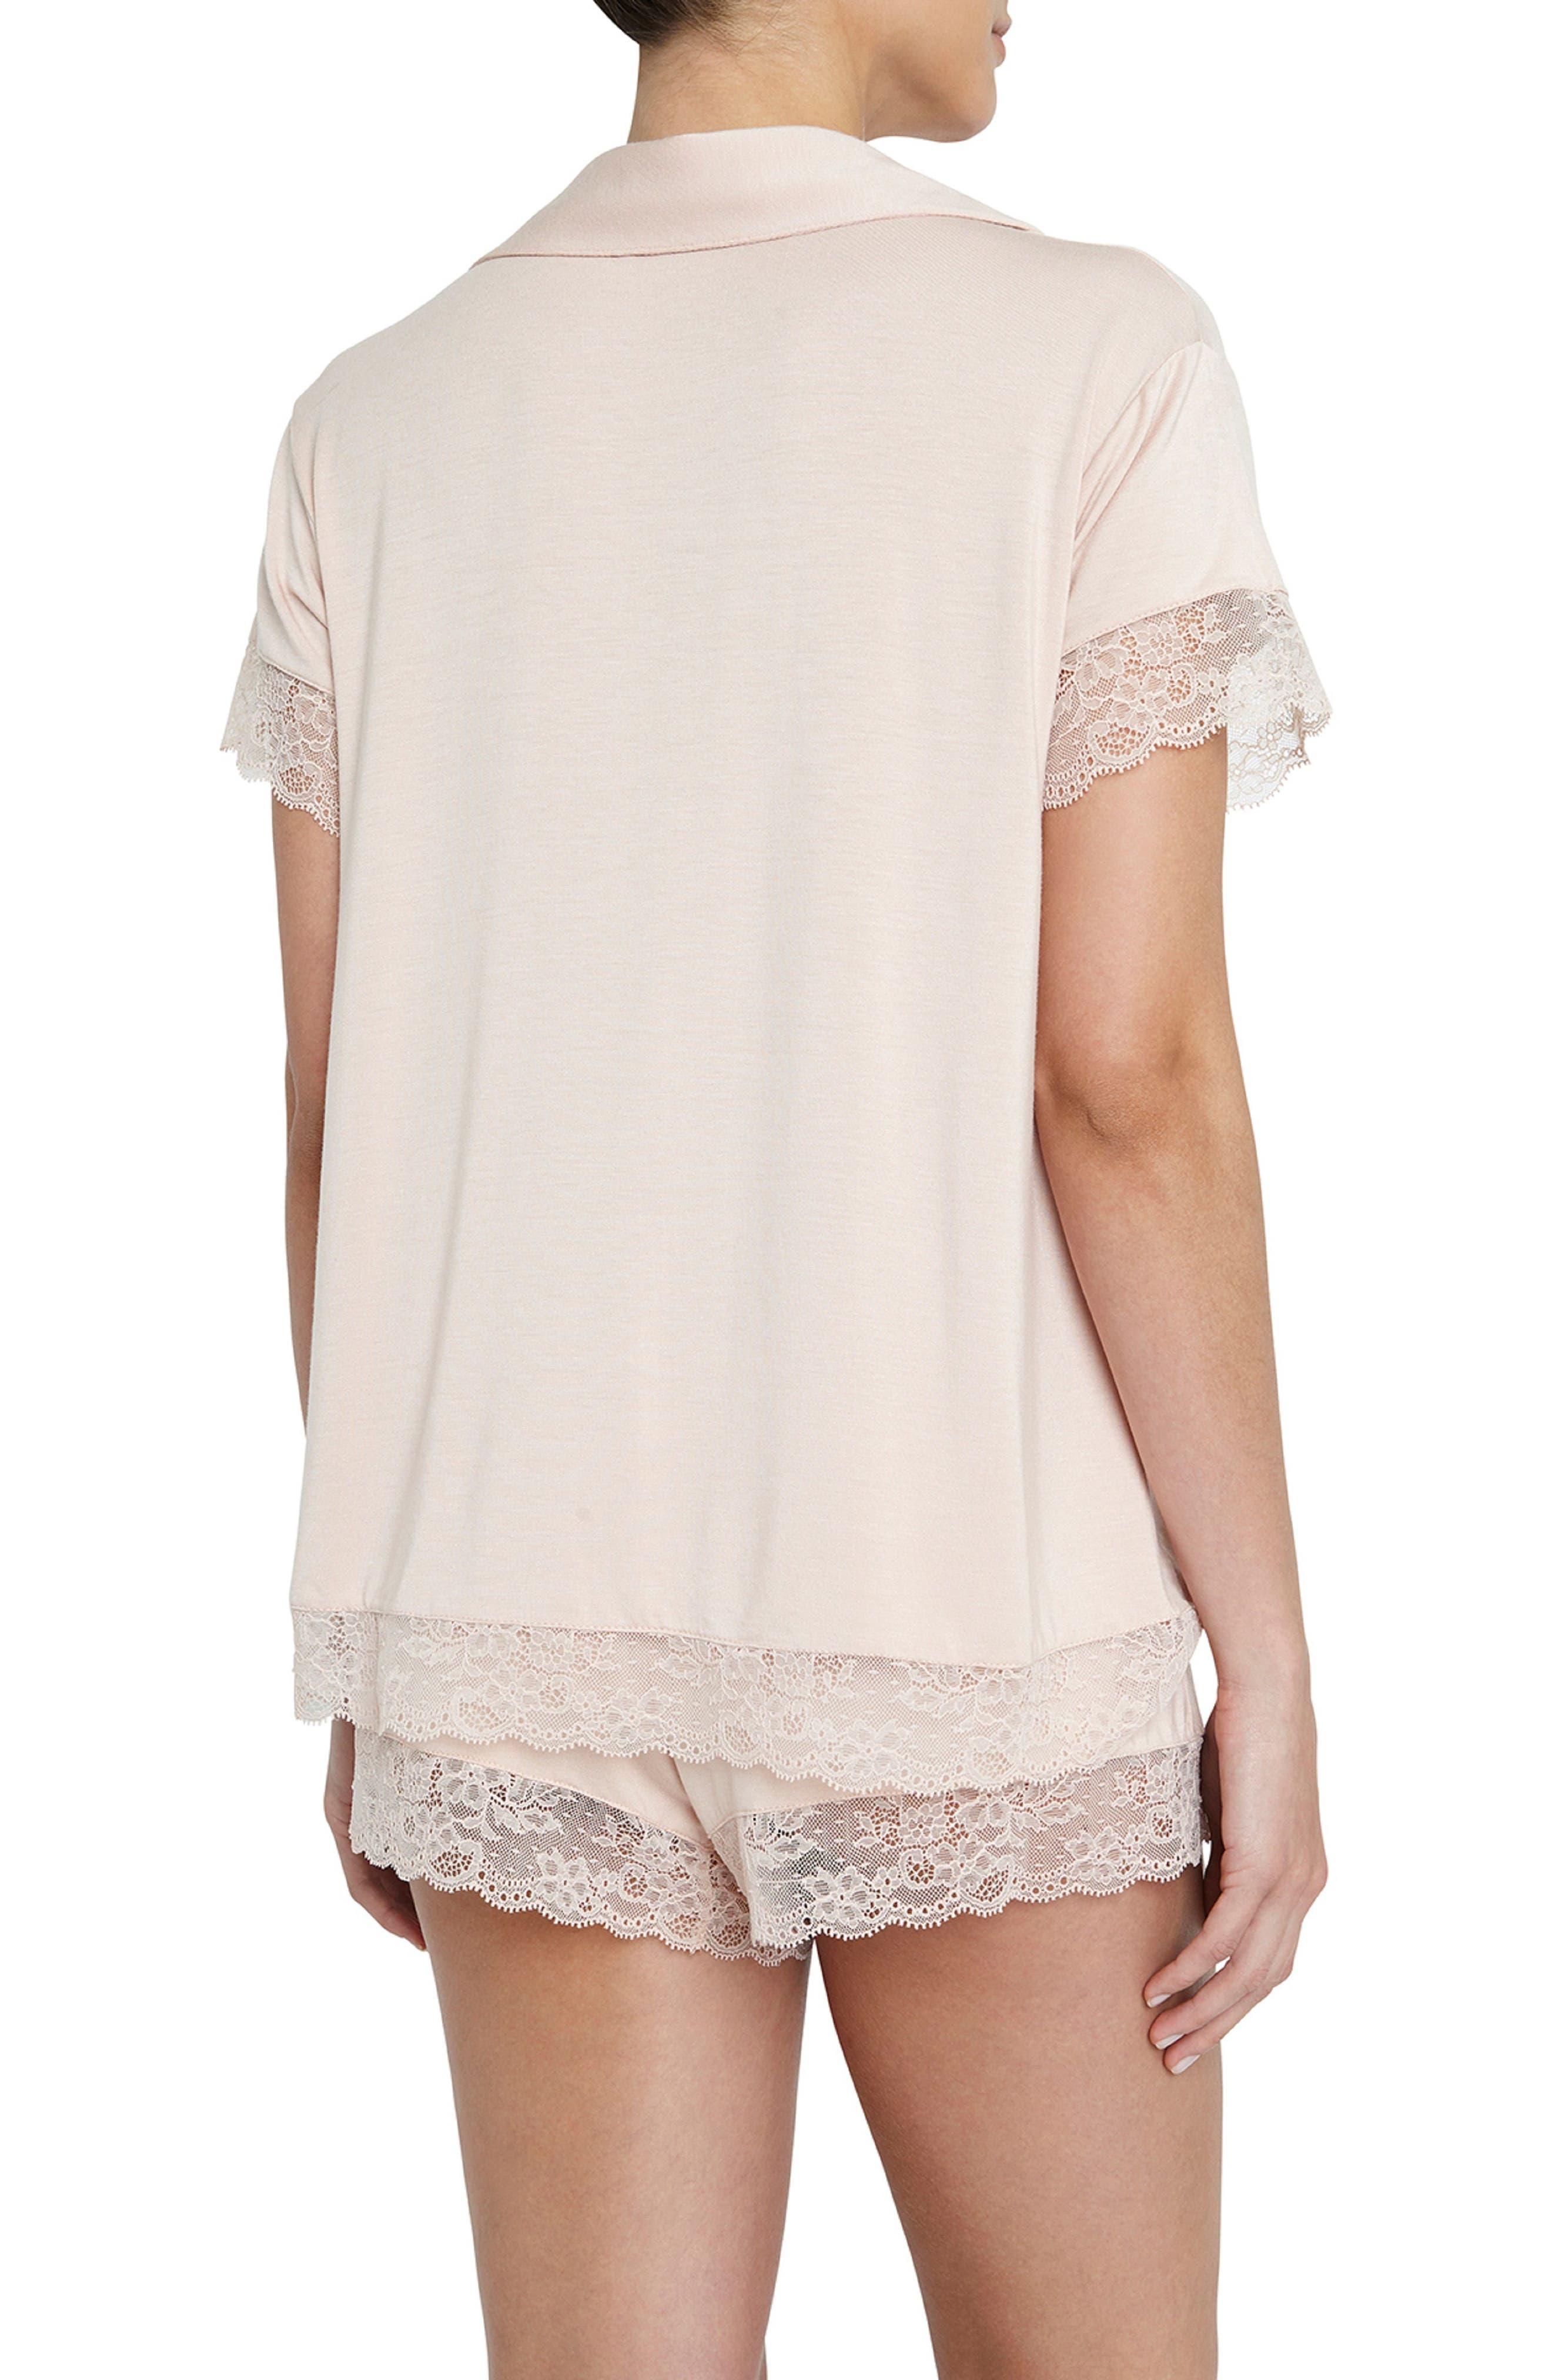 Malou the Lace Short Pajamas,                             Alternate thumbnail 2, color,                             652